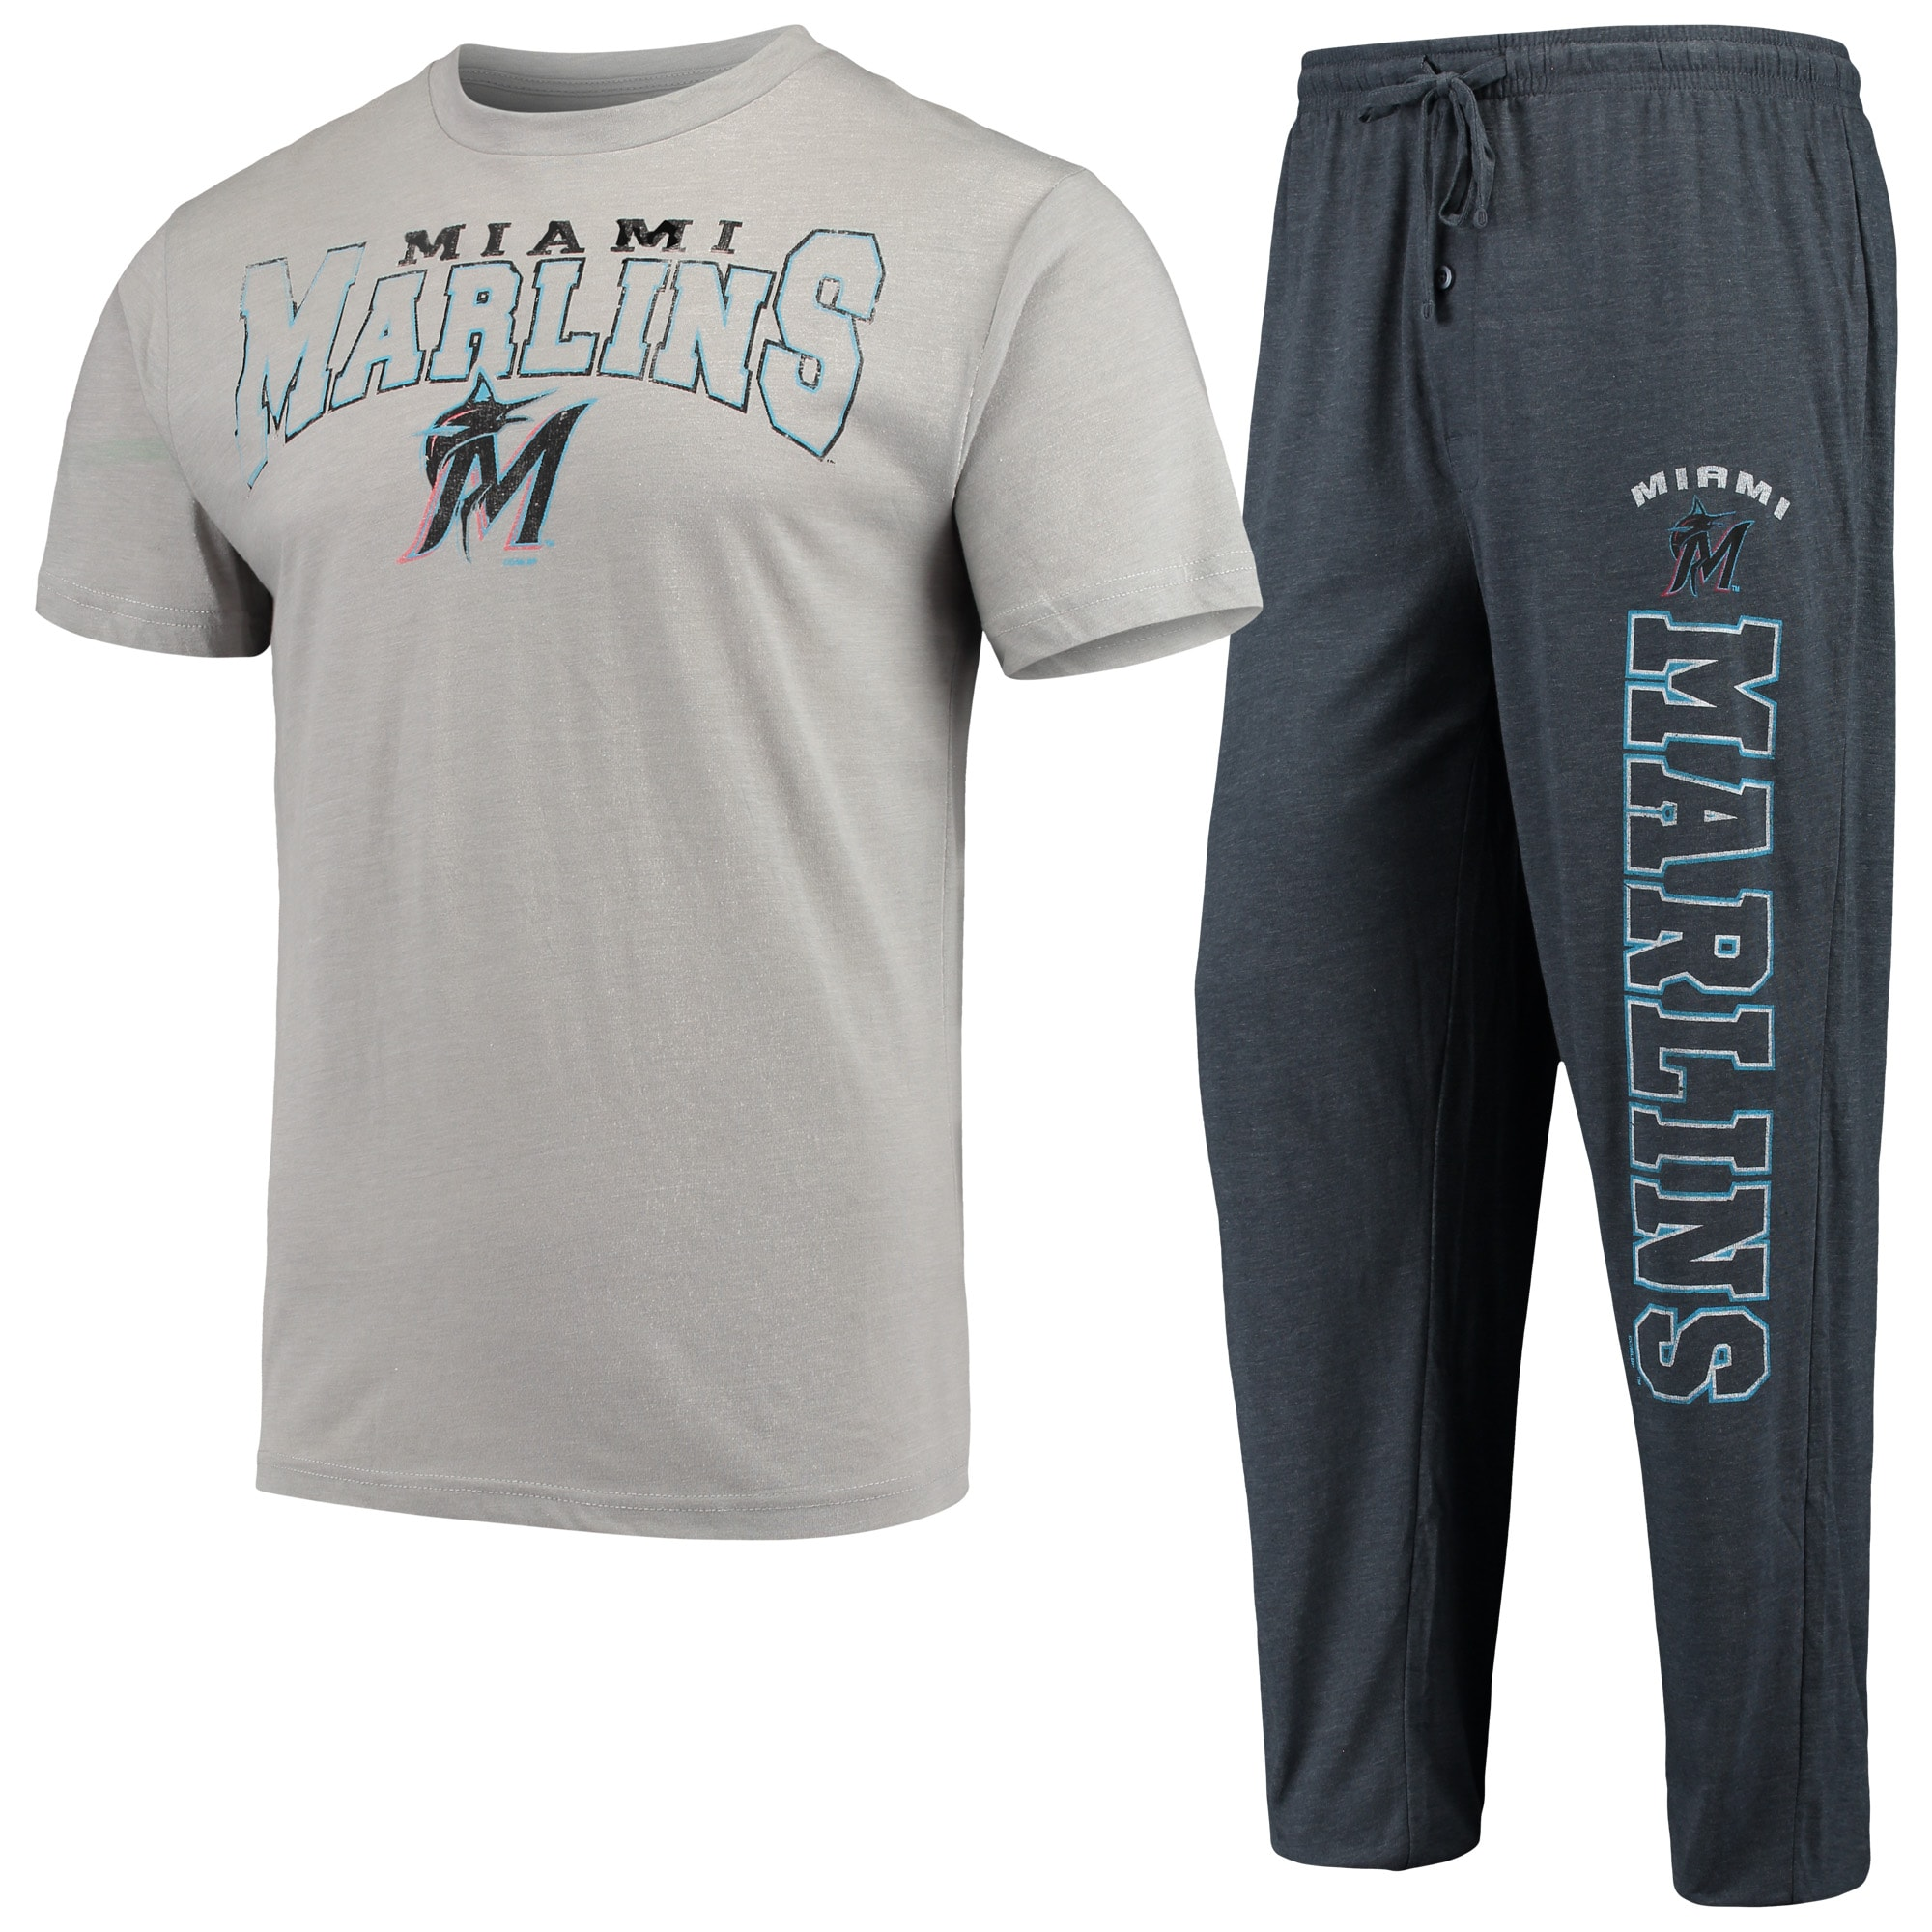 Miami Marlins Concepts Sport Topic T-Shirt & Pants Sleep Set - Heathered Gray/Charcoal